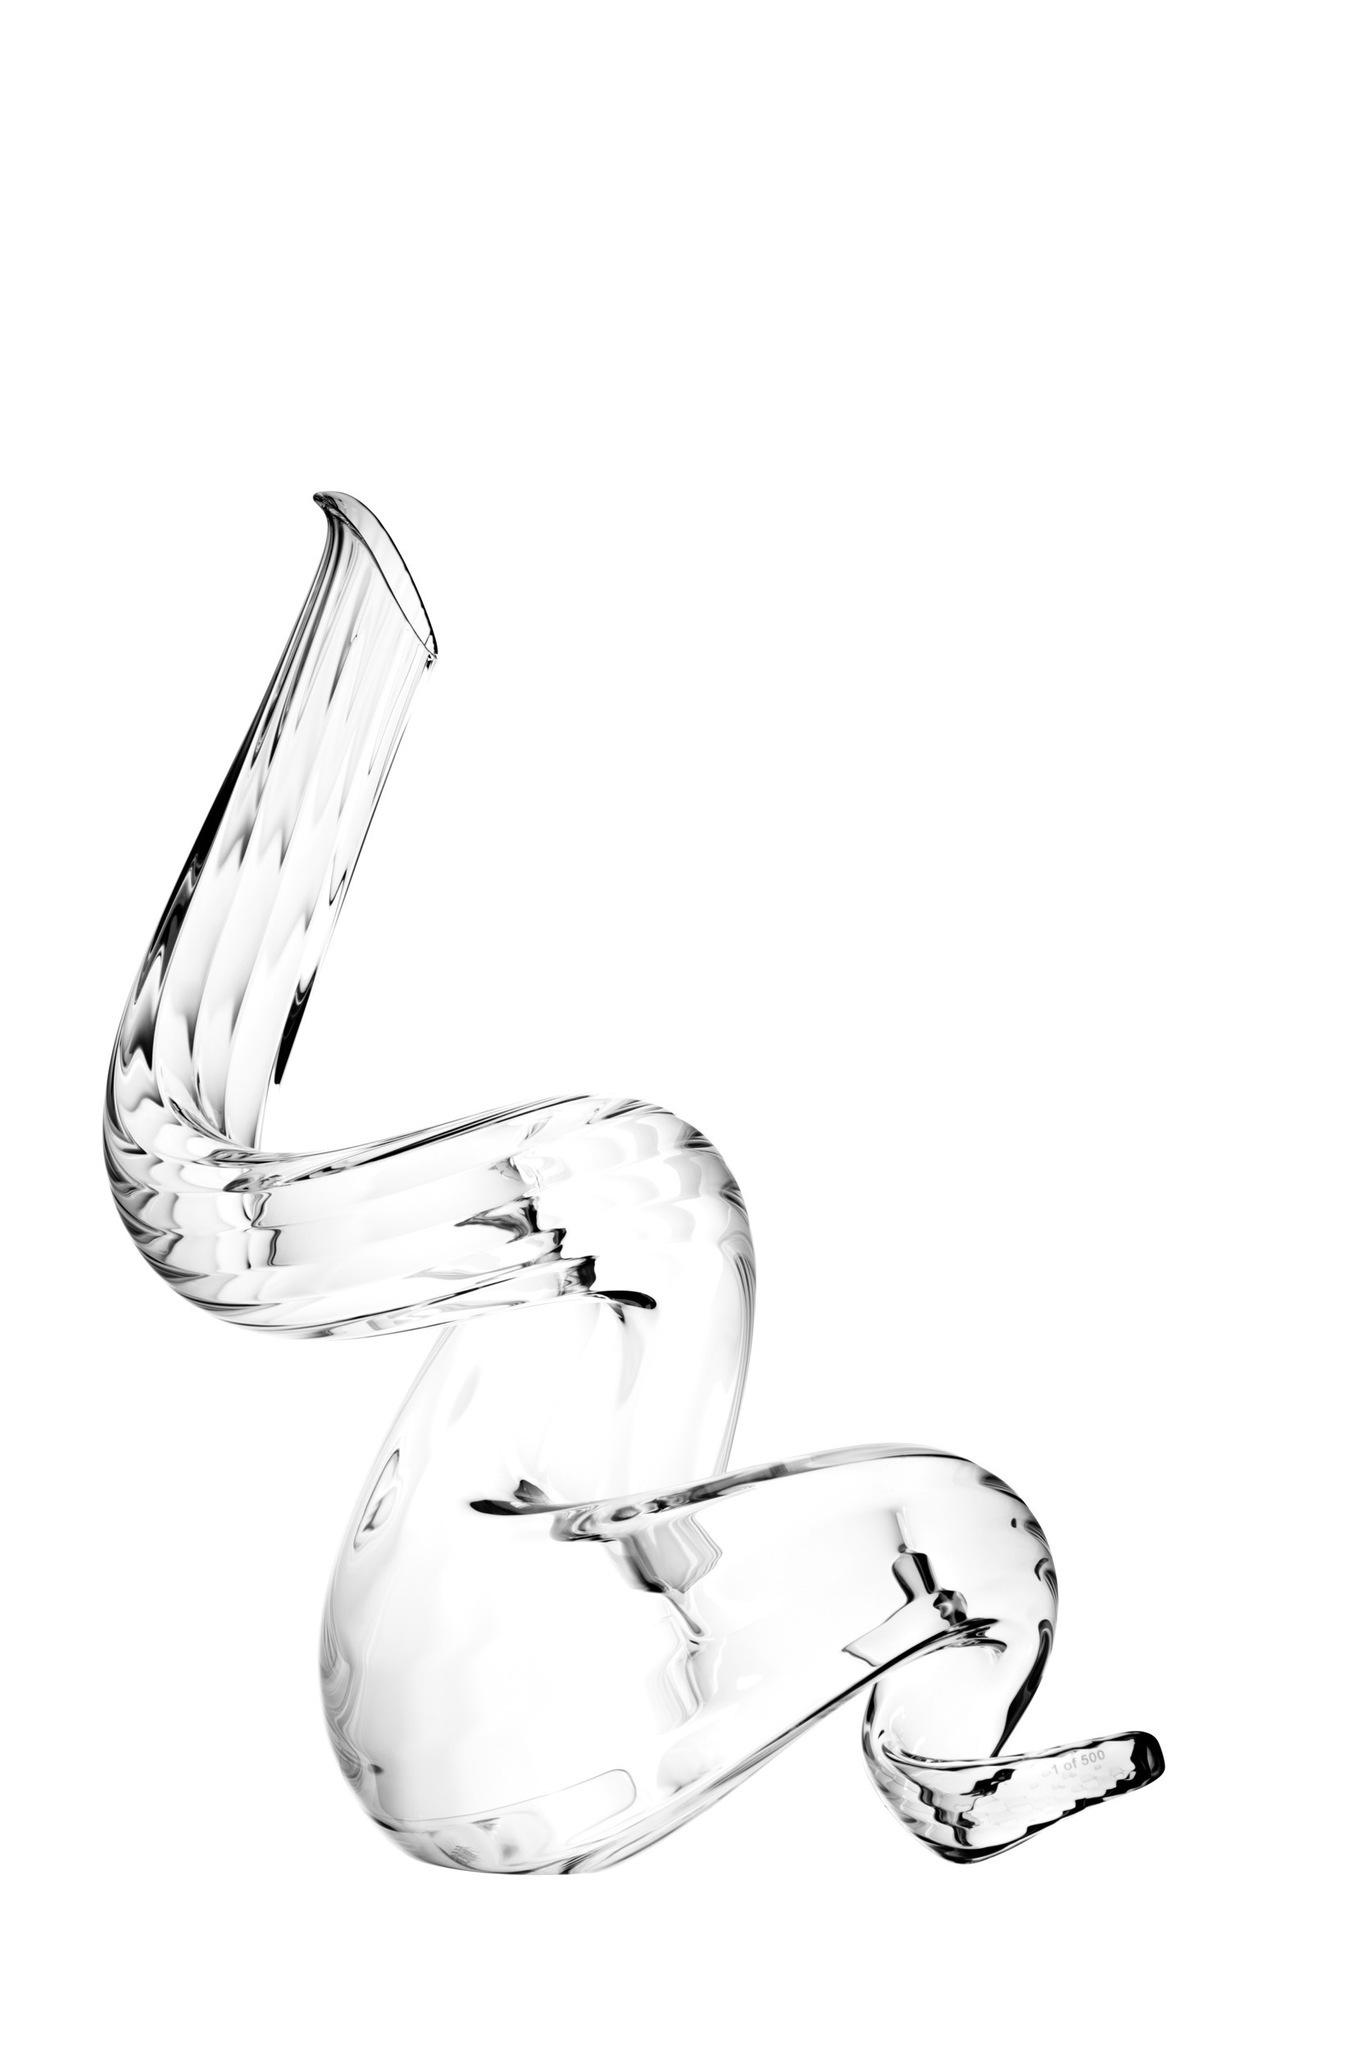 Декантер Riedel, «Titano Boa» Decanter, 1.5 литра